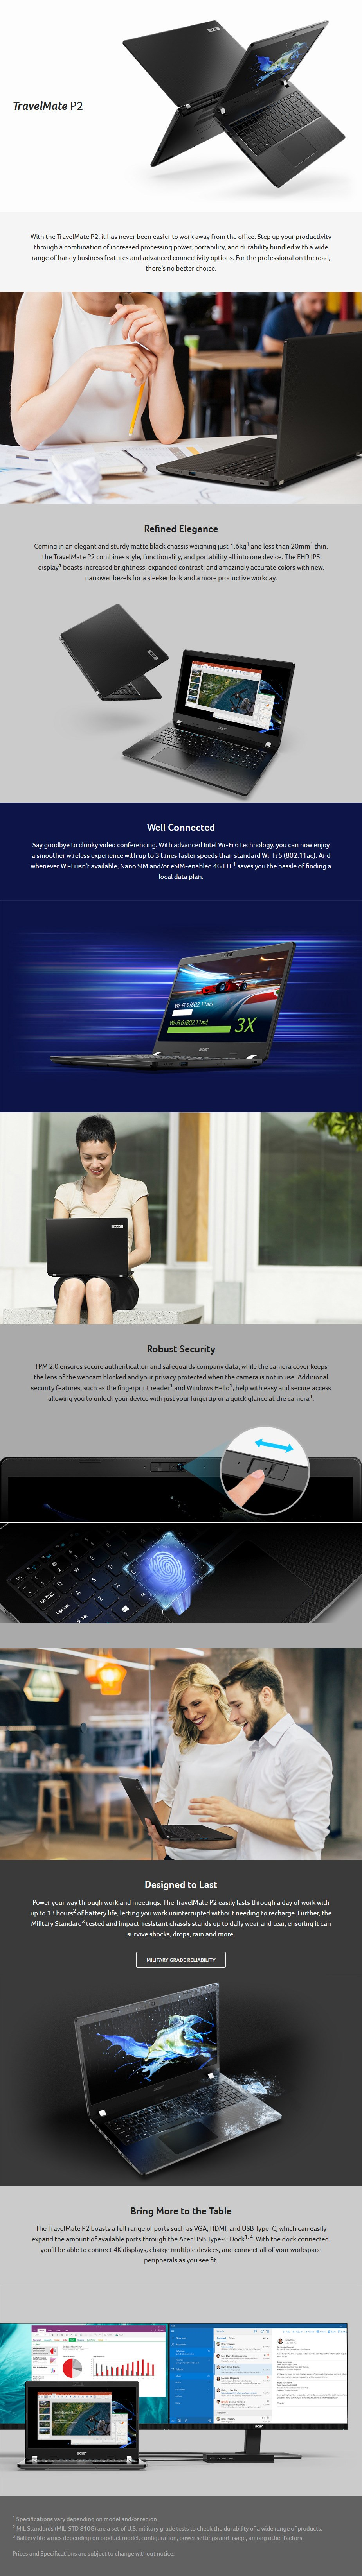 acer-travelmate-p214-14-laptop-i710510u-8gb-512gb-ssd-win10-pro-ac37410-1-2-.jpg